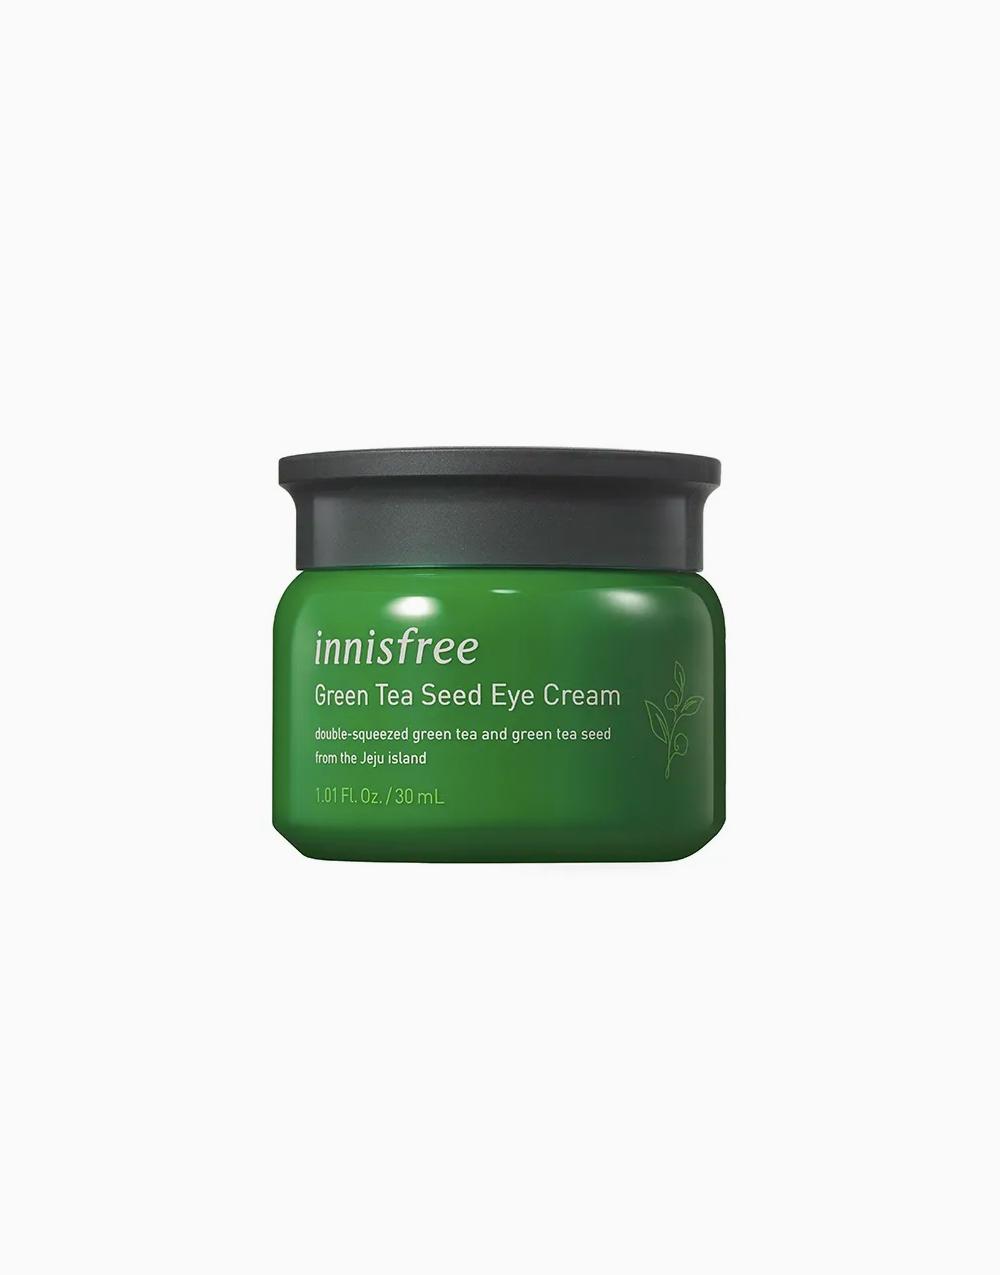 Green Tea Seed Eye Cream (30ml) by Innisfree